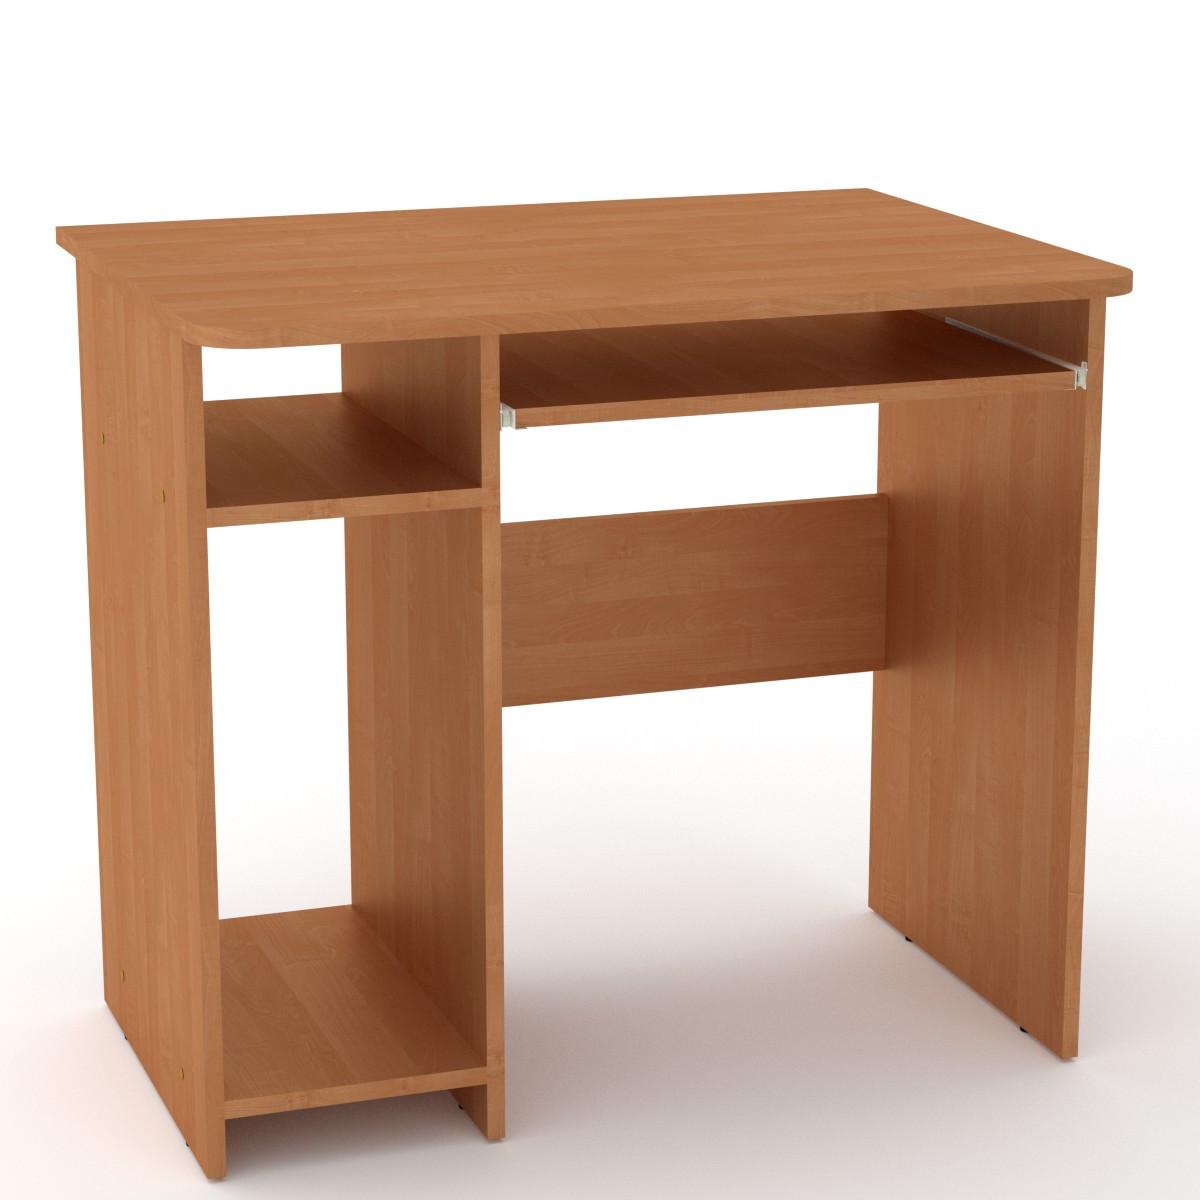 Стол компьютерный СКМ-12 ольха Компанит (82х60х74 см)